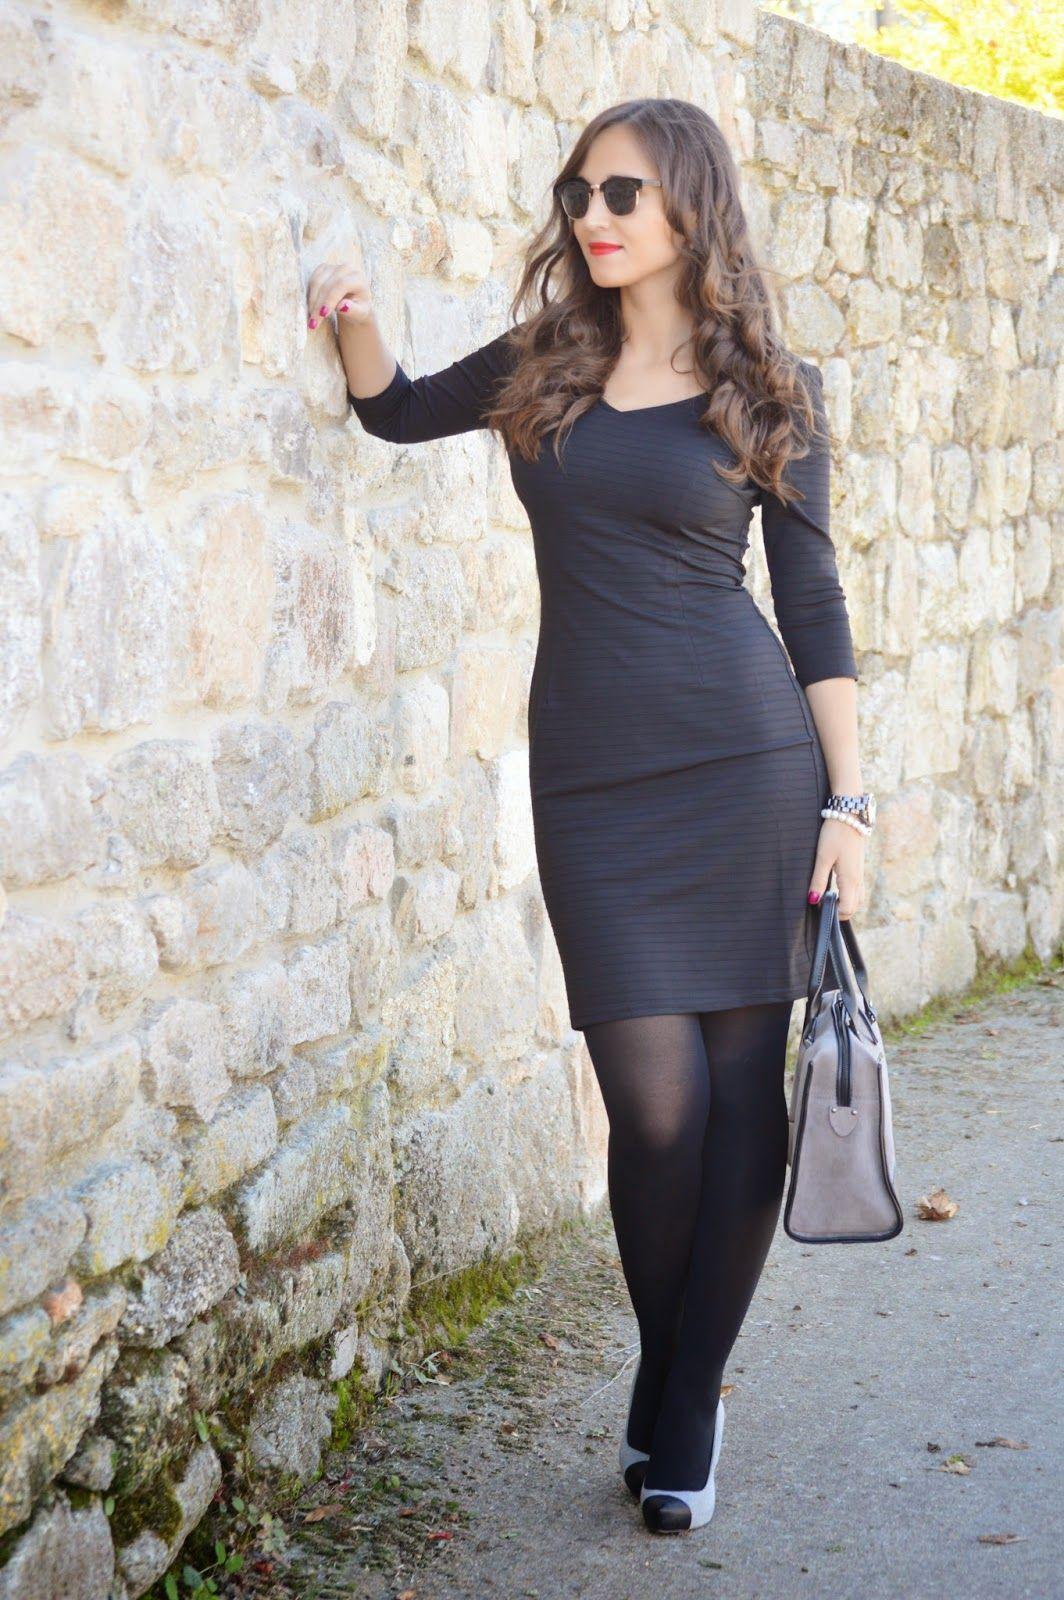 1000 Maneras De Vestir Robert Pietri Dress With Stockings Fashion Tights Tight Dresses [ 1600 x 1064 Pixel ]